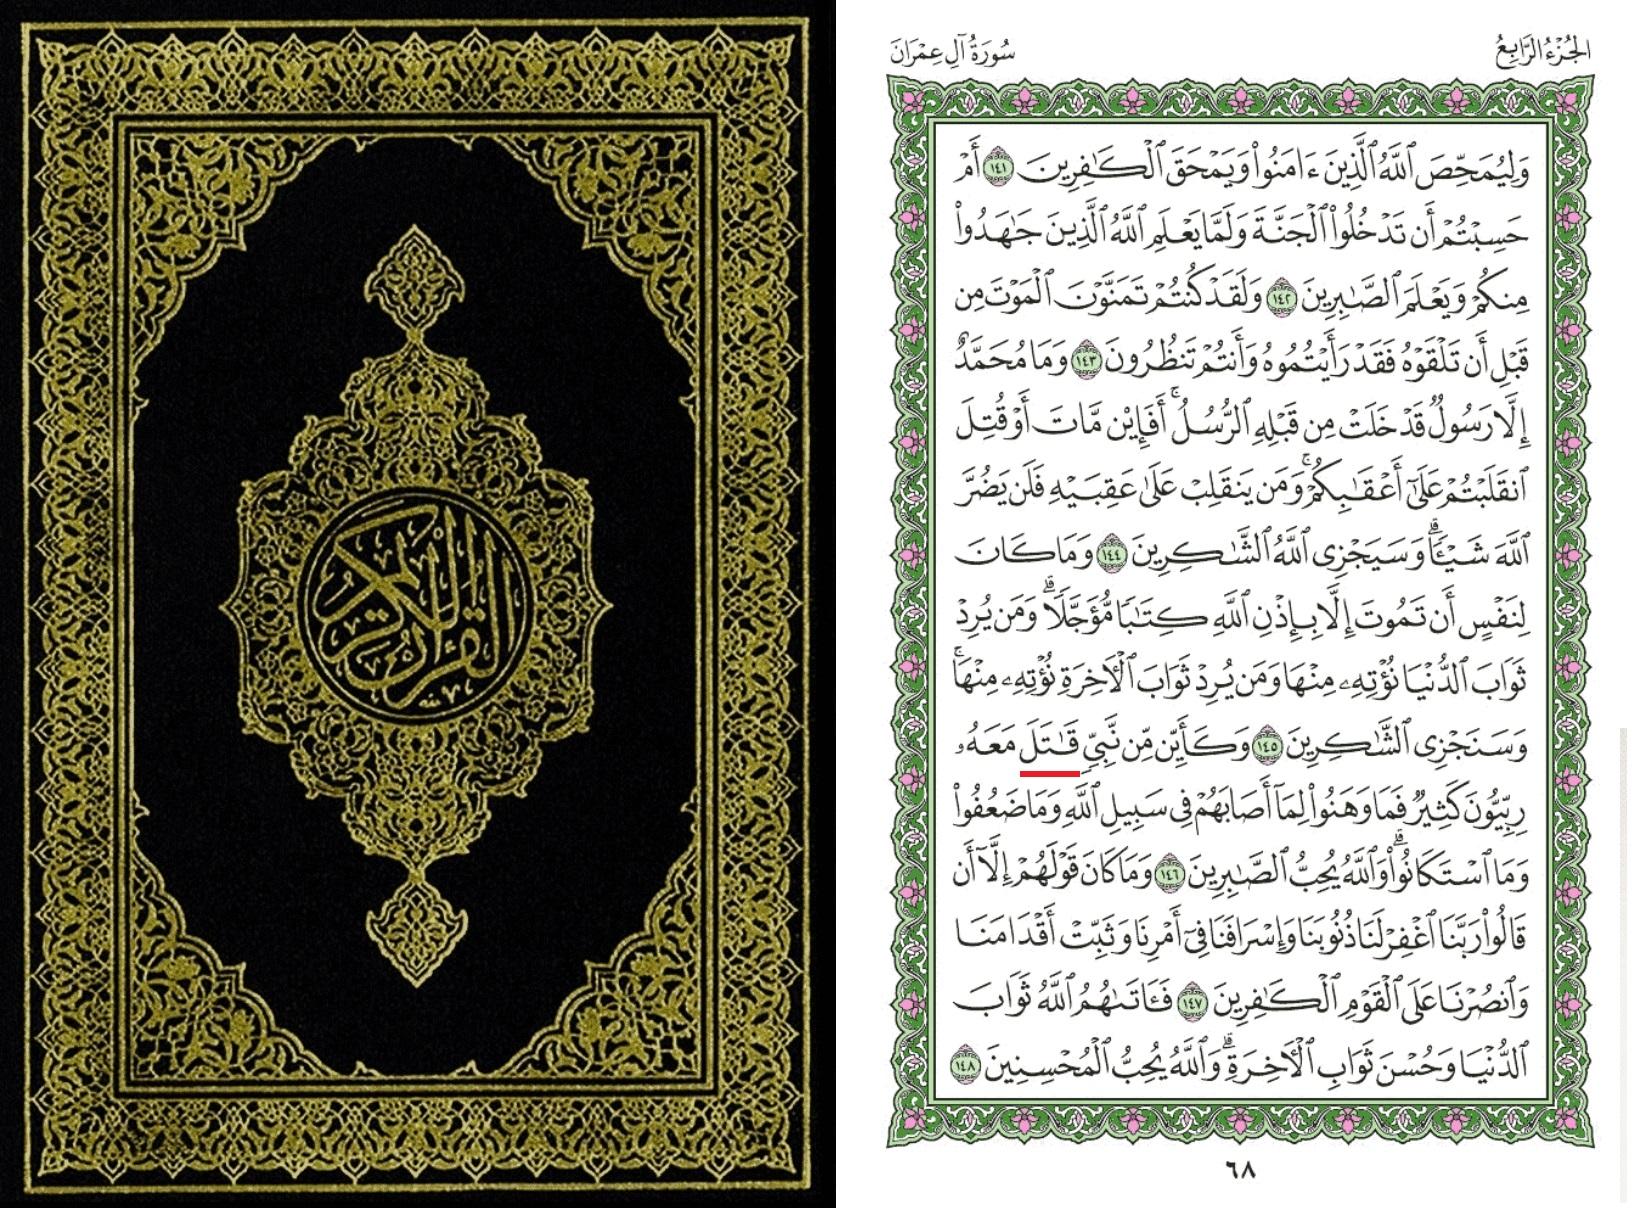 mos7af-e-7afs-ayat-e-qatala